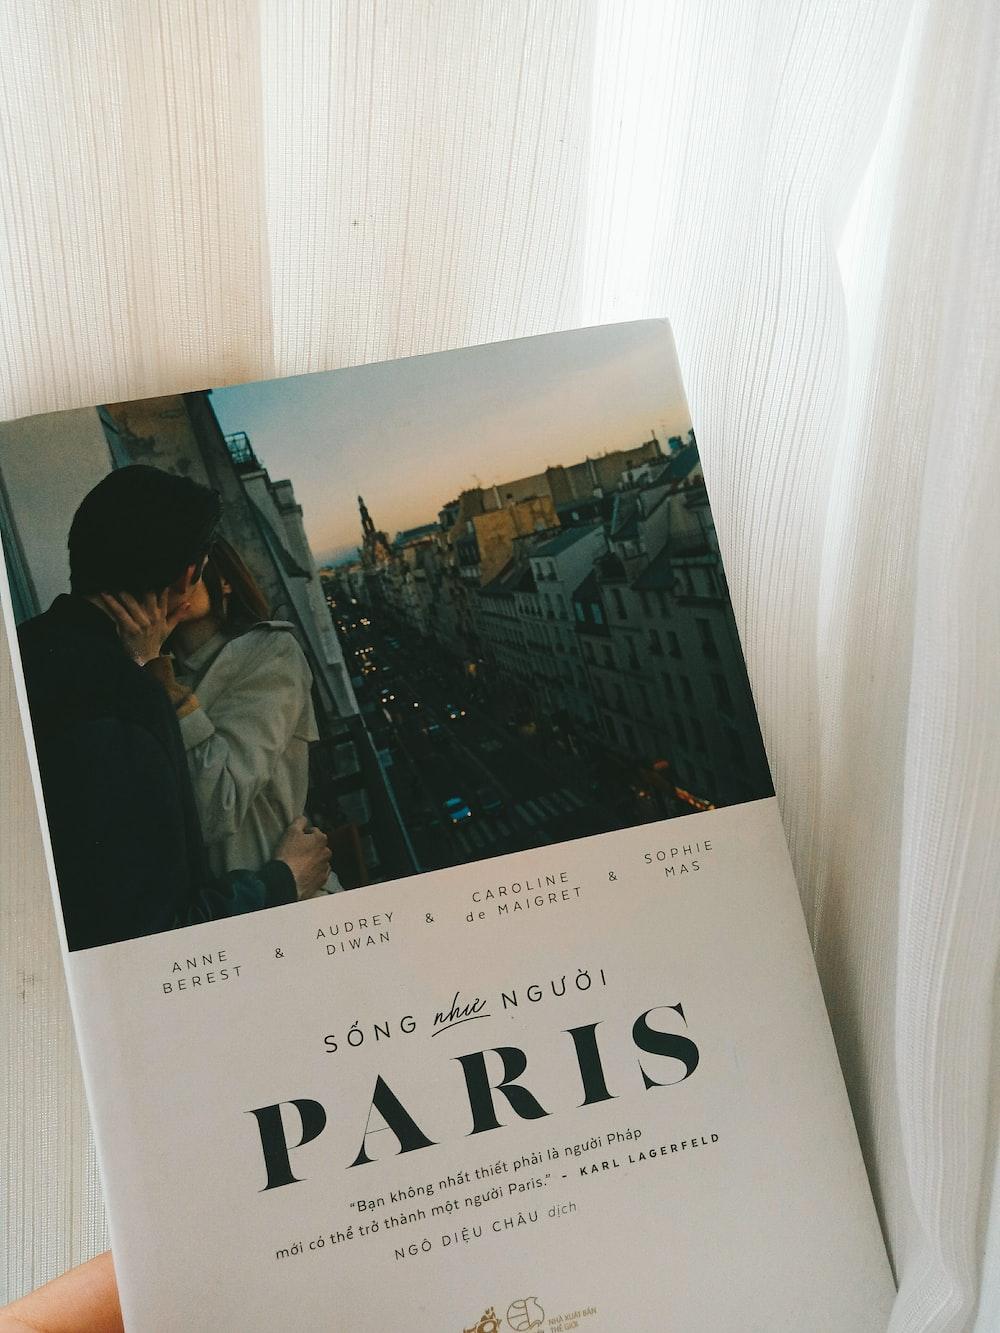 Song Nguoi Paris book